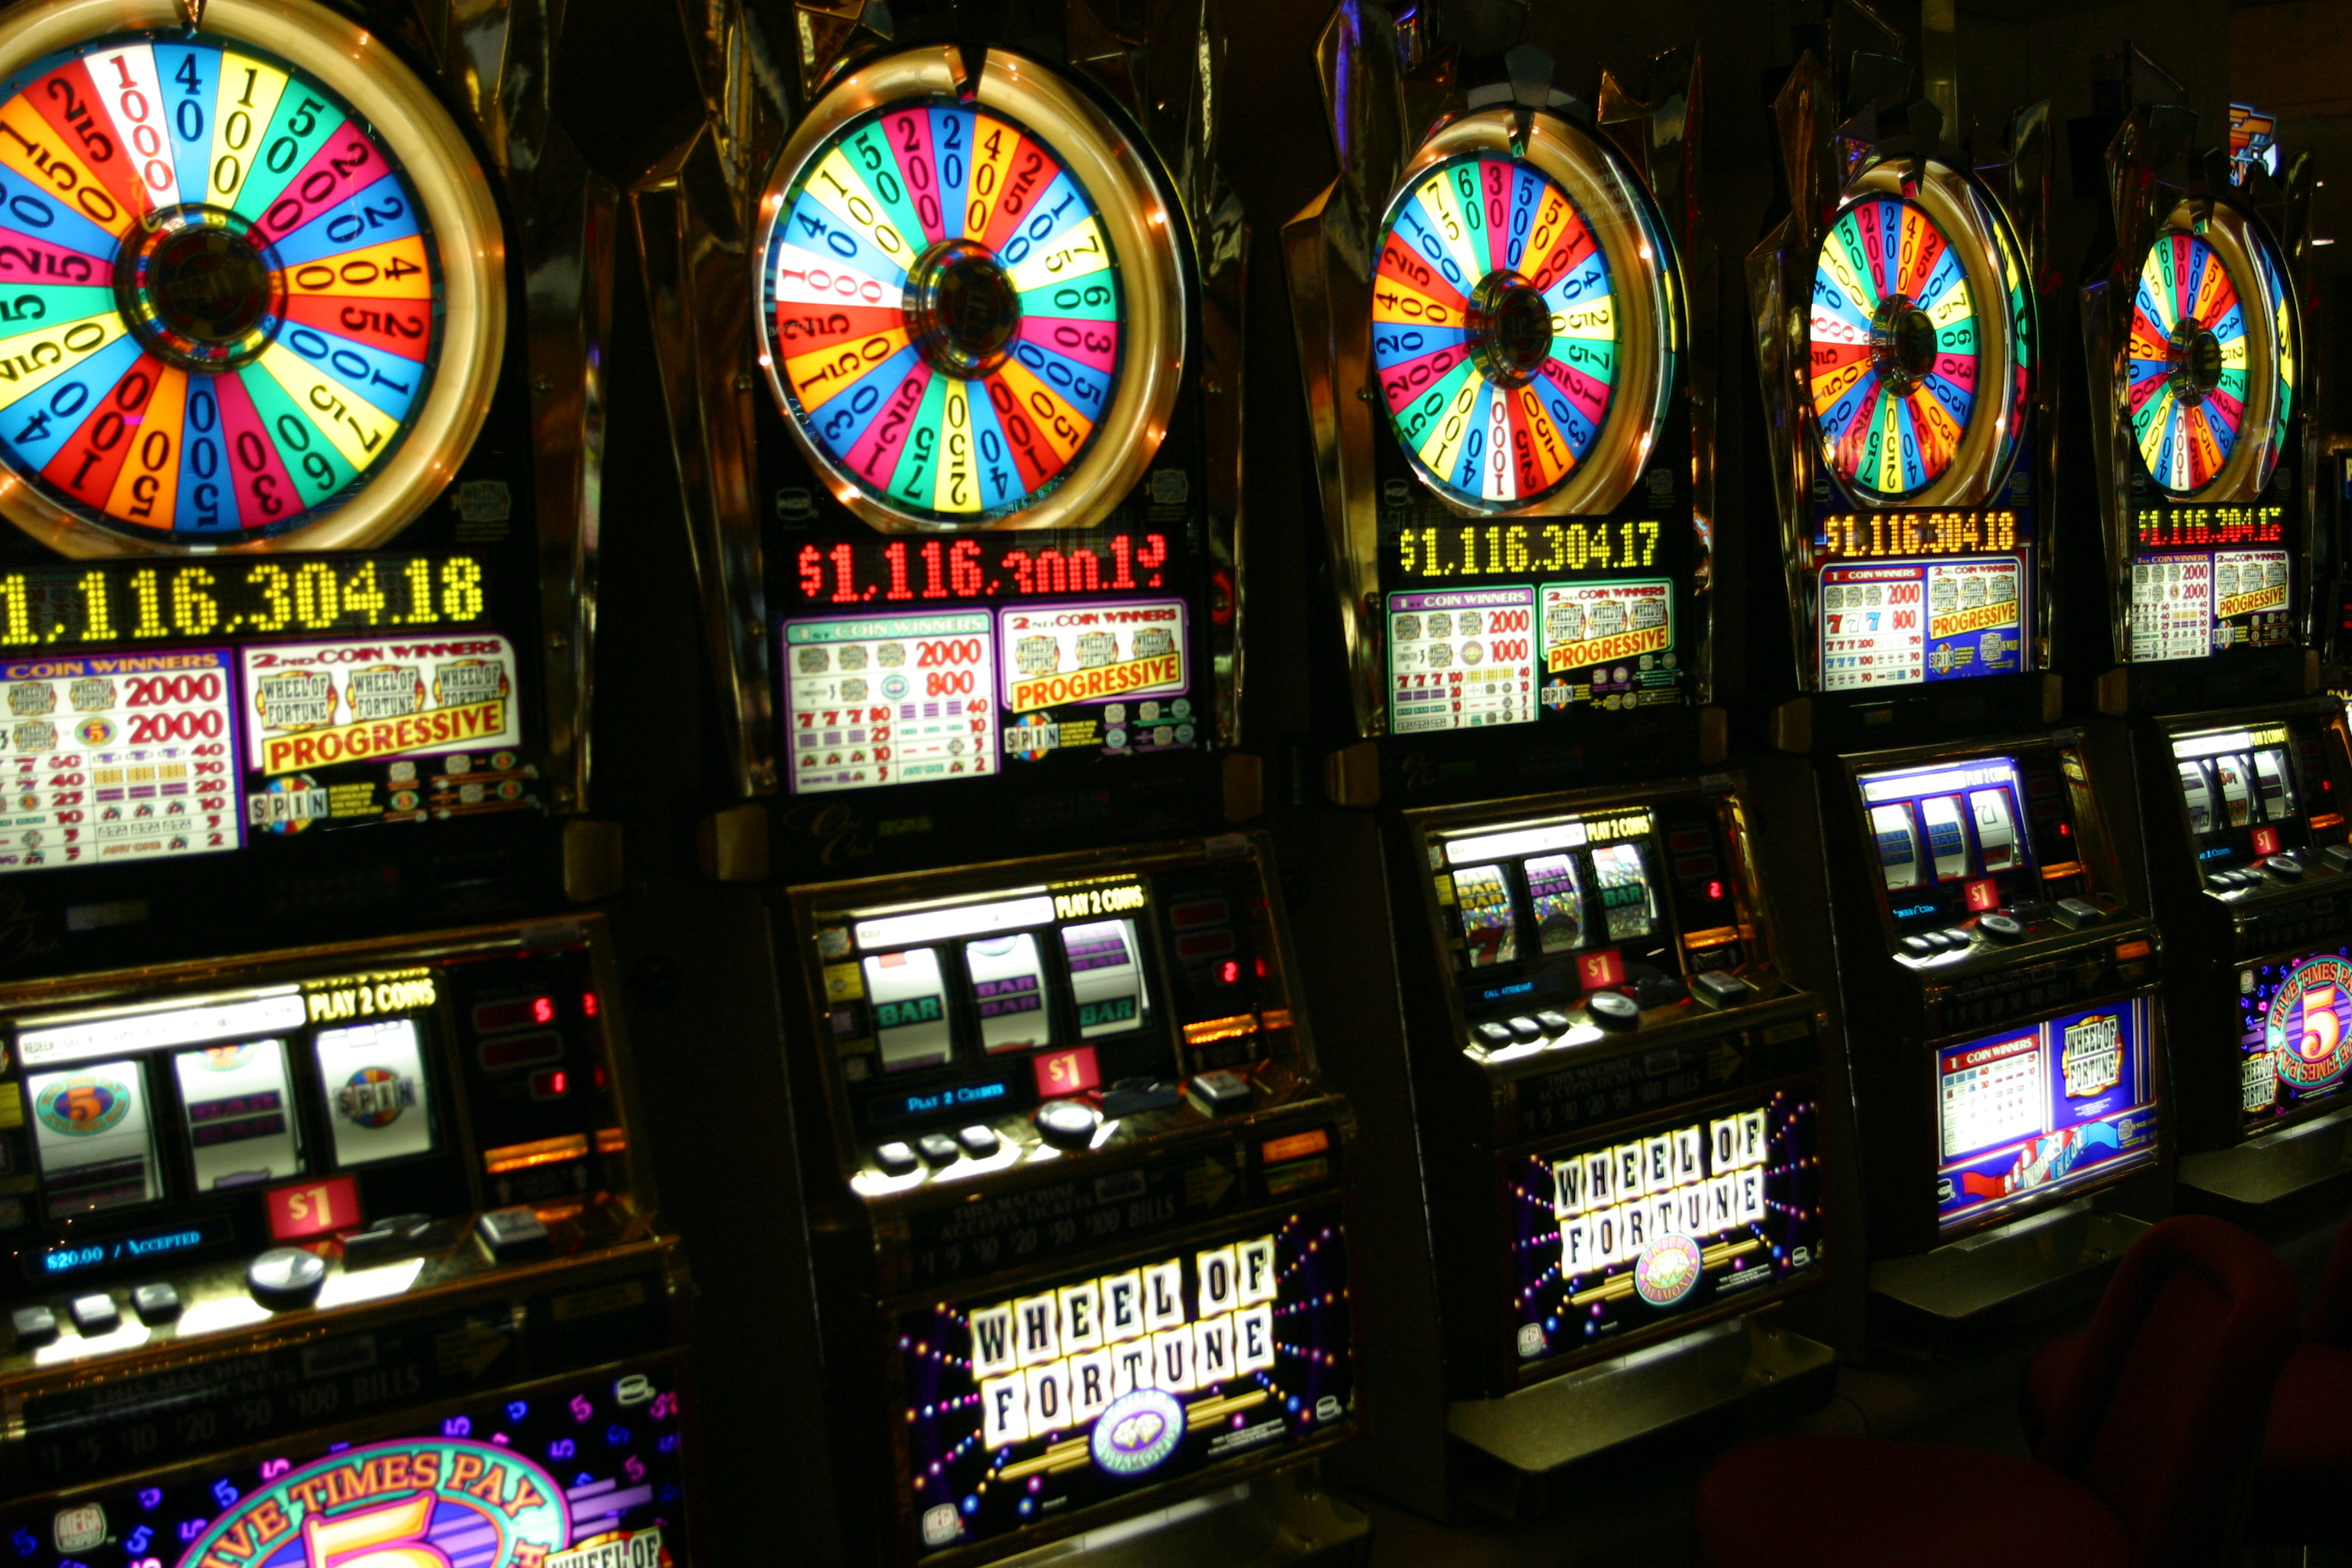 betfair blackjack review